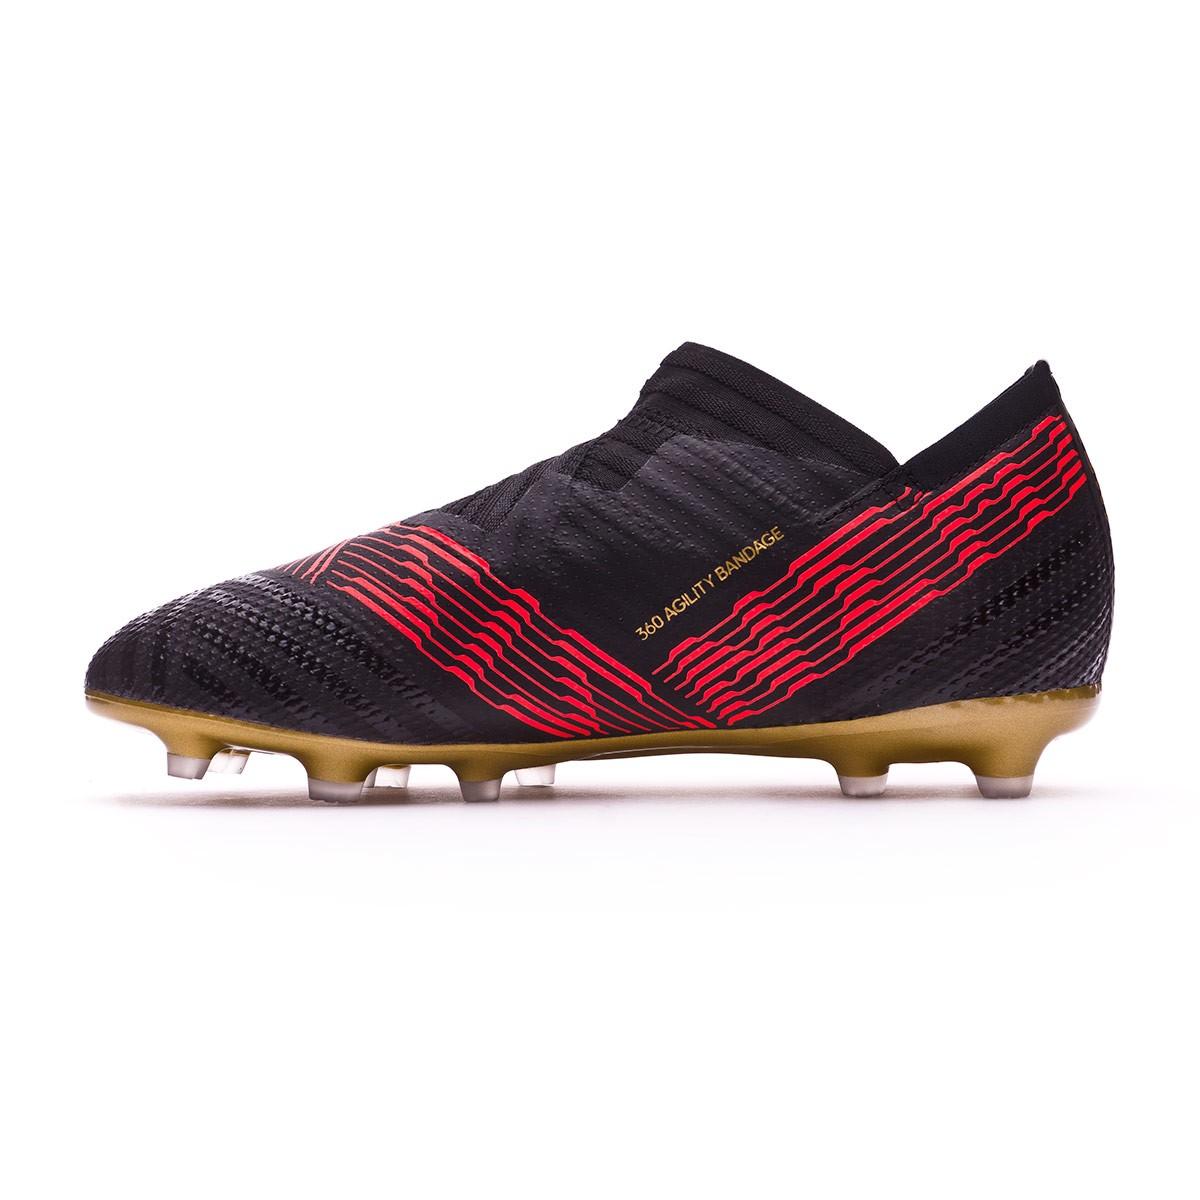 6fd1b268c Football Boots adidas Kids Nemeziz 17+ 360 Agility FG Core black-Solar red  - Football store Fútbol Emotion